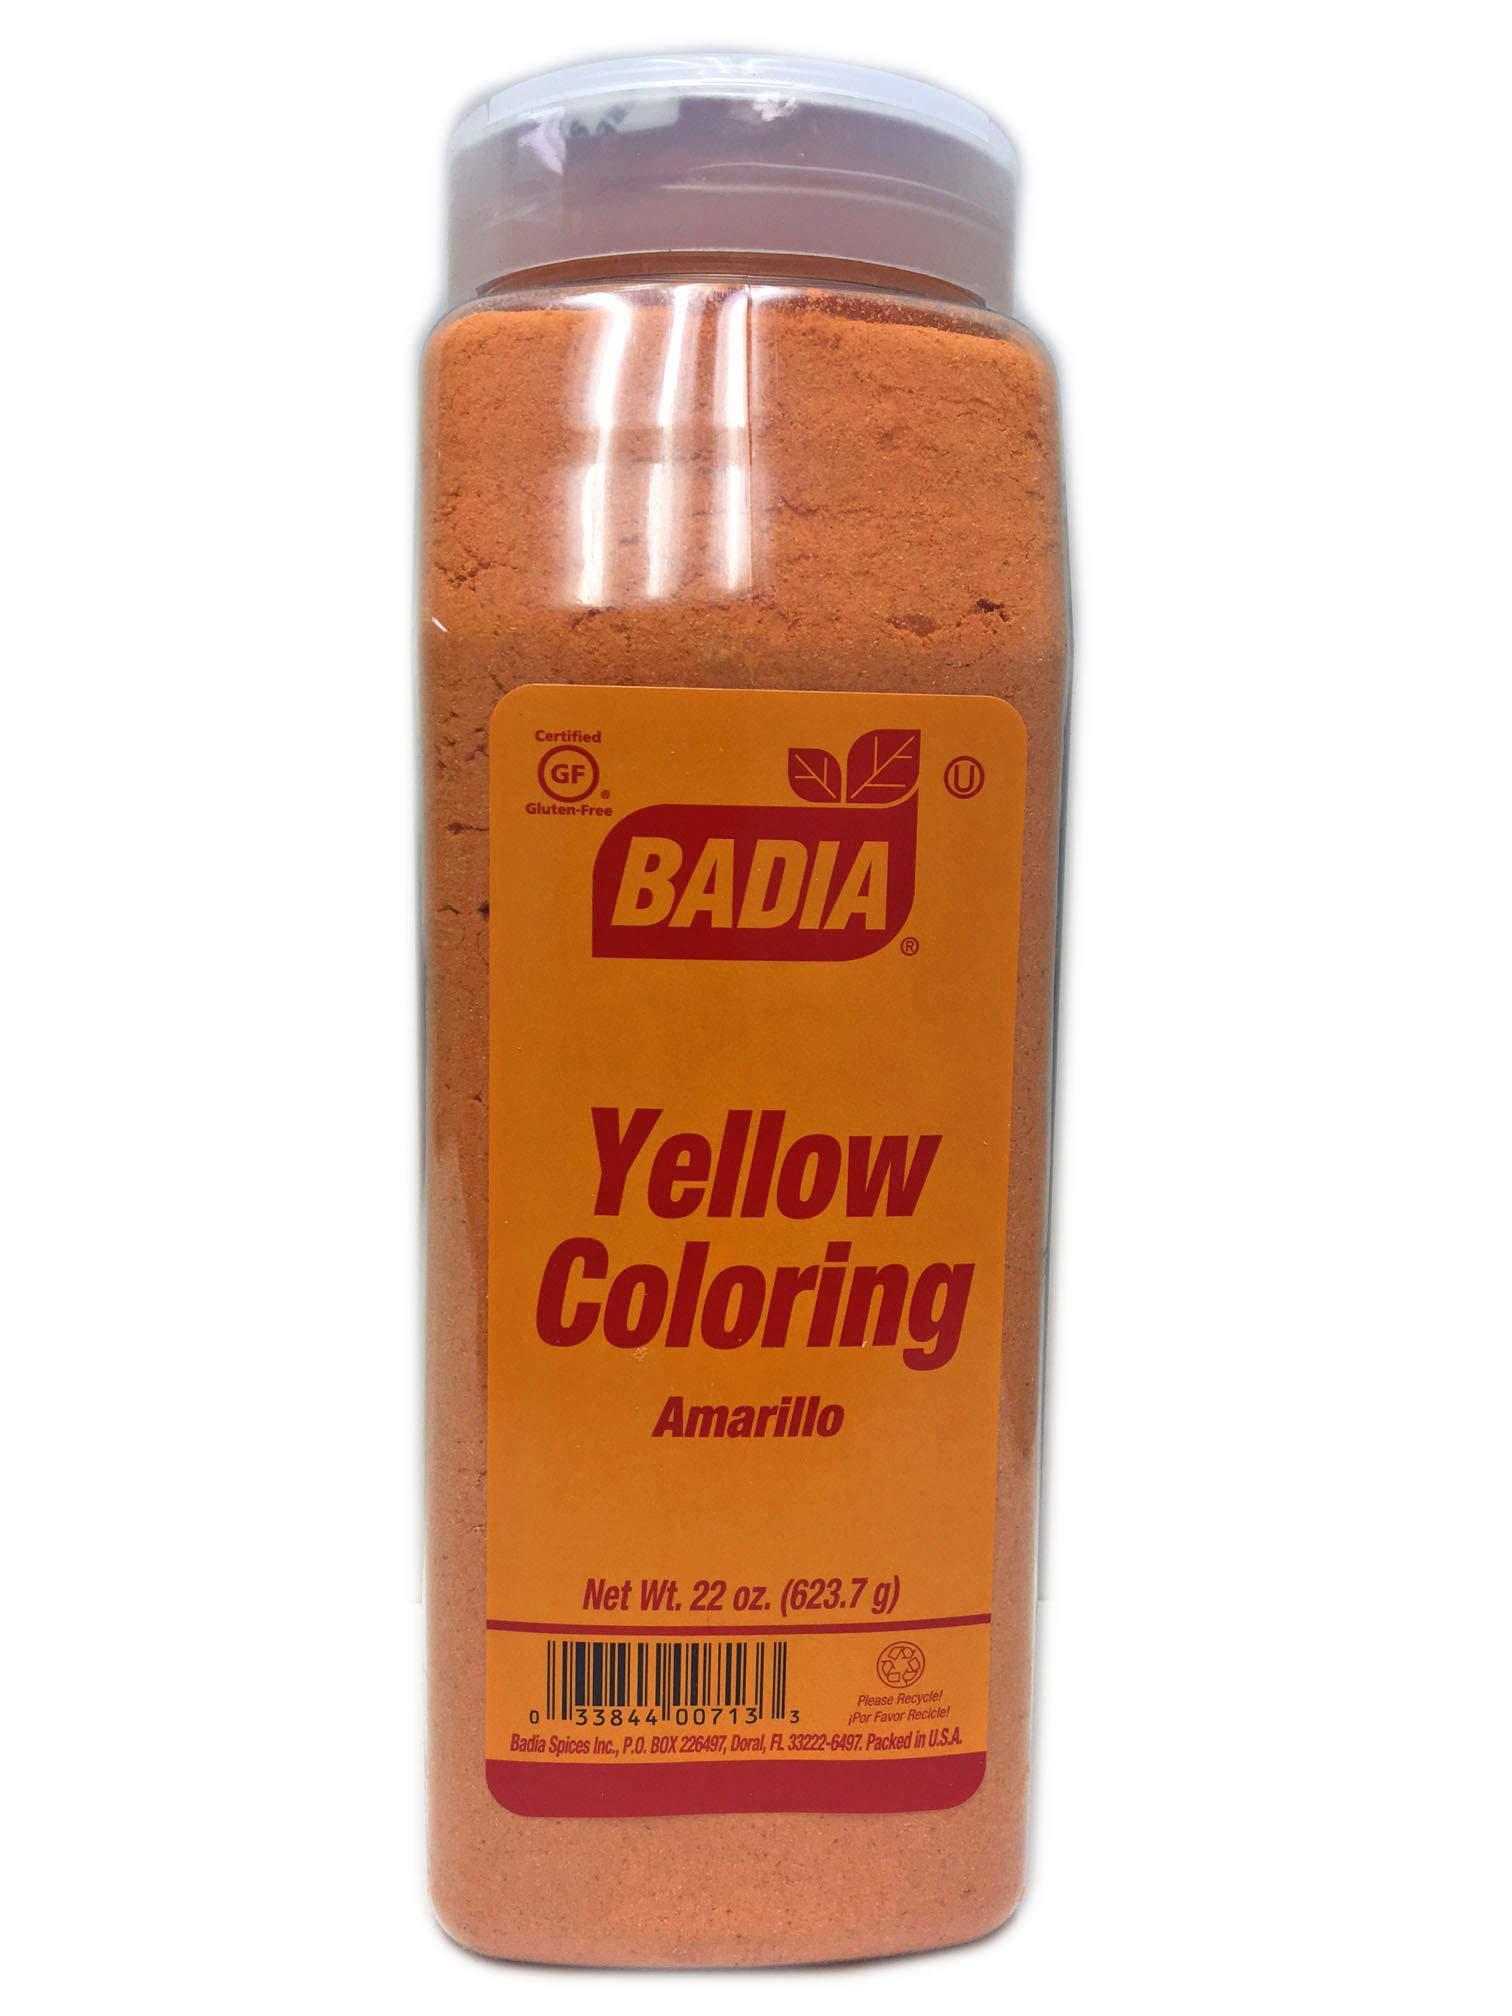 2 PACK Yellow Coloring Food Powder/Amarillo Color Gluten Free Kosher 2x22 oz